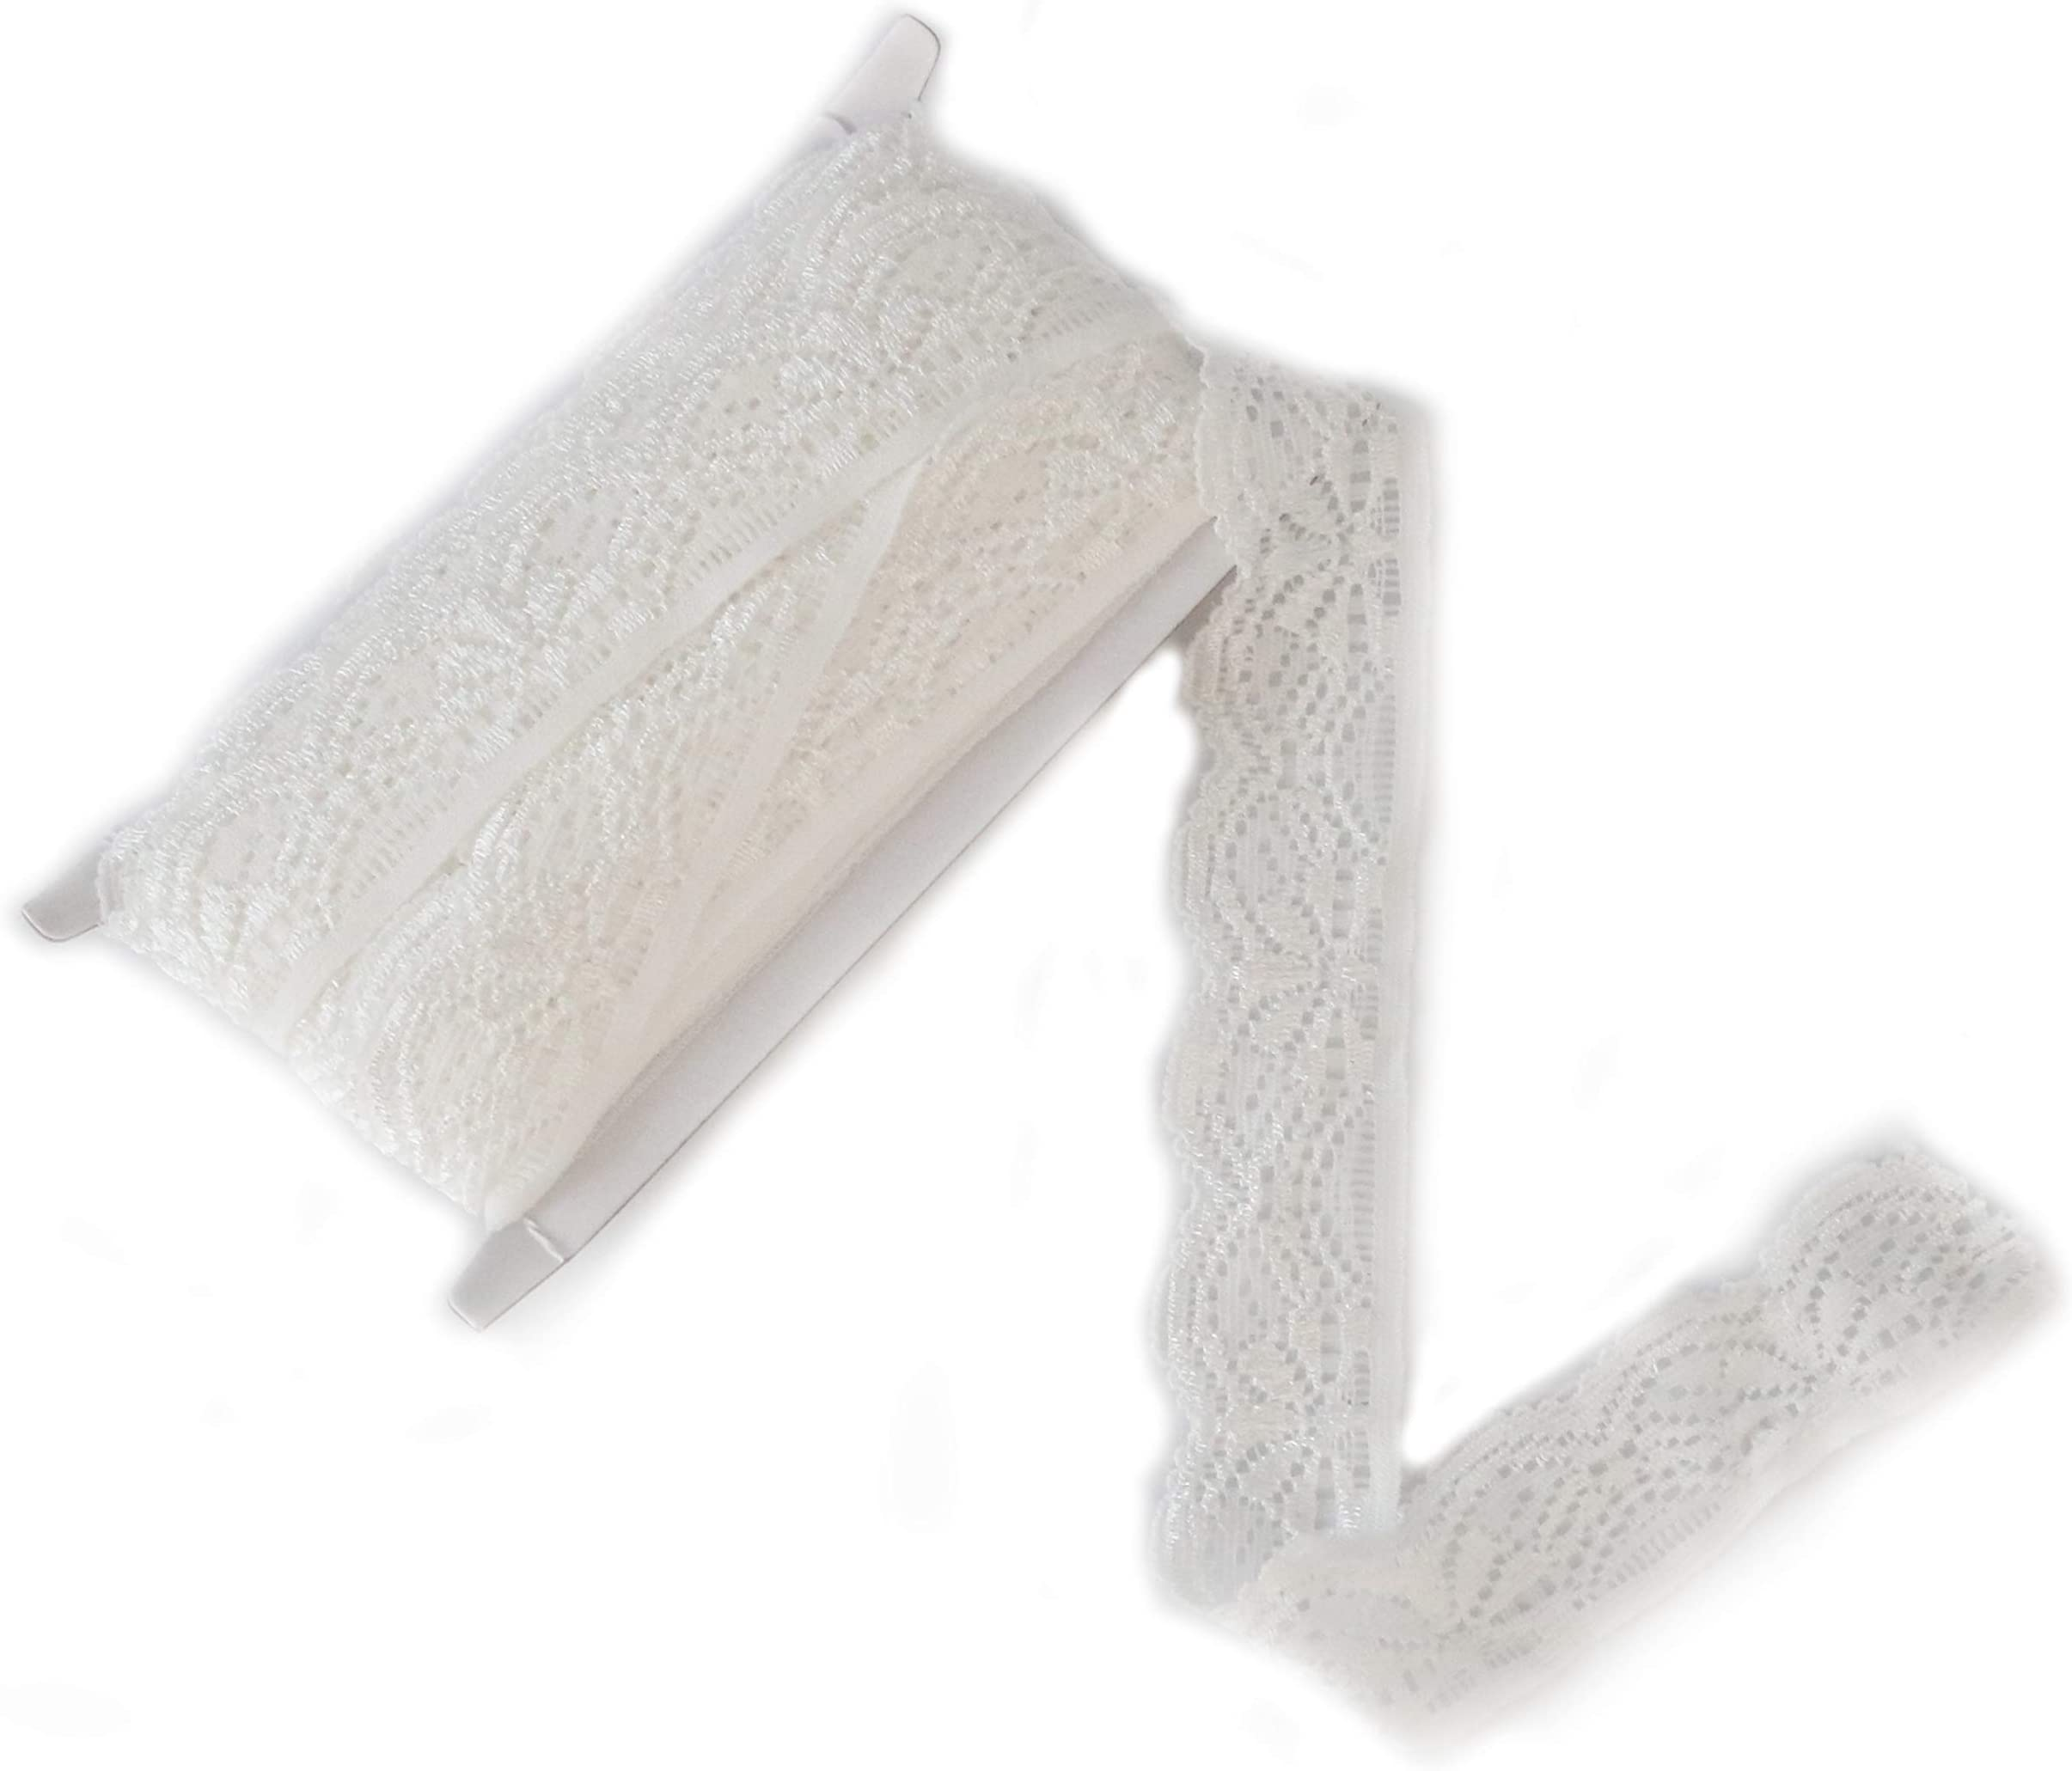 Floral Baby Headbands Lace Trim Wedding Garter 1 Yard Coral 2 Elastic trim Premium Lace Stretch Elastic Trim Lingerie